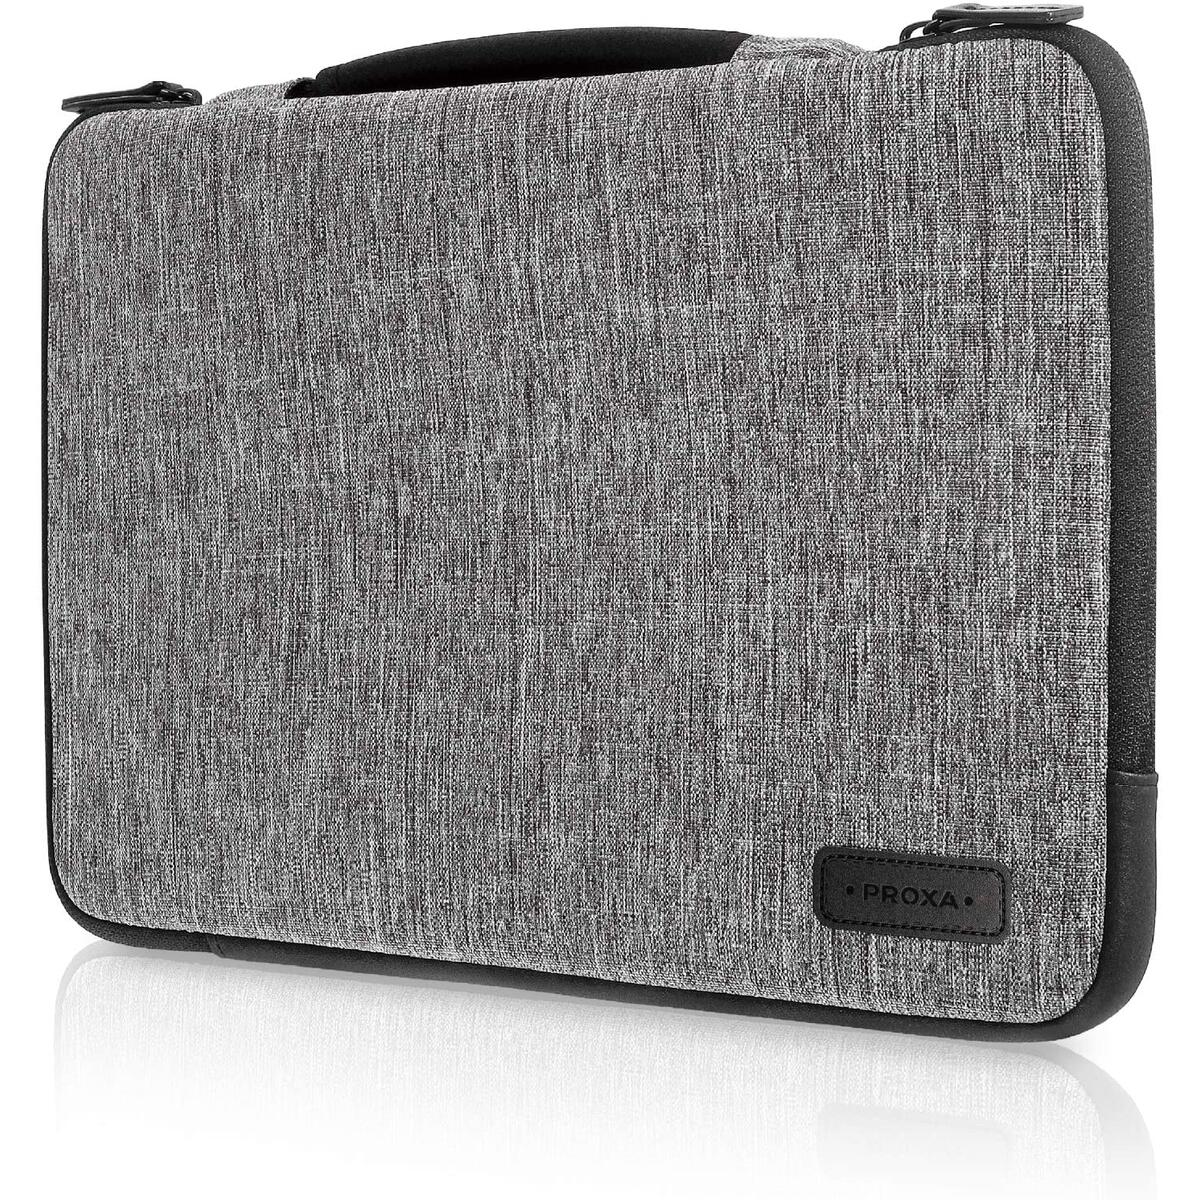 PROXA Laptop Sleeve Bag Briefcase Cover for 13-13.3